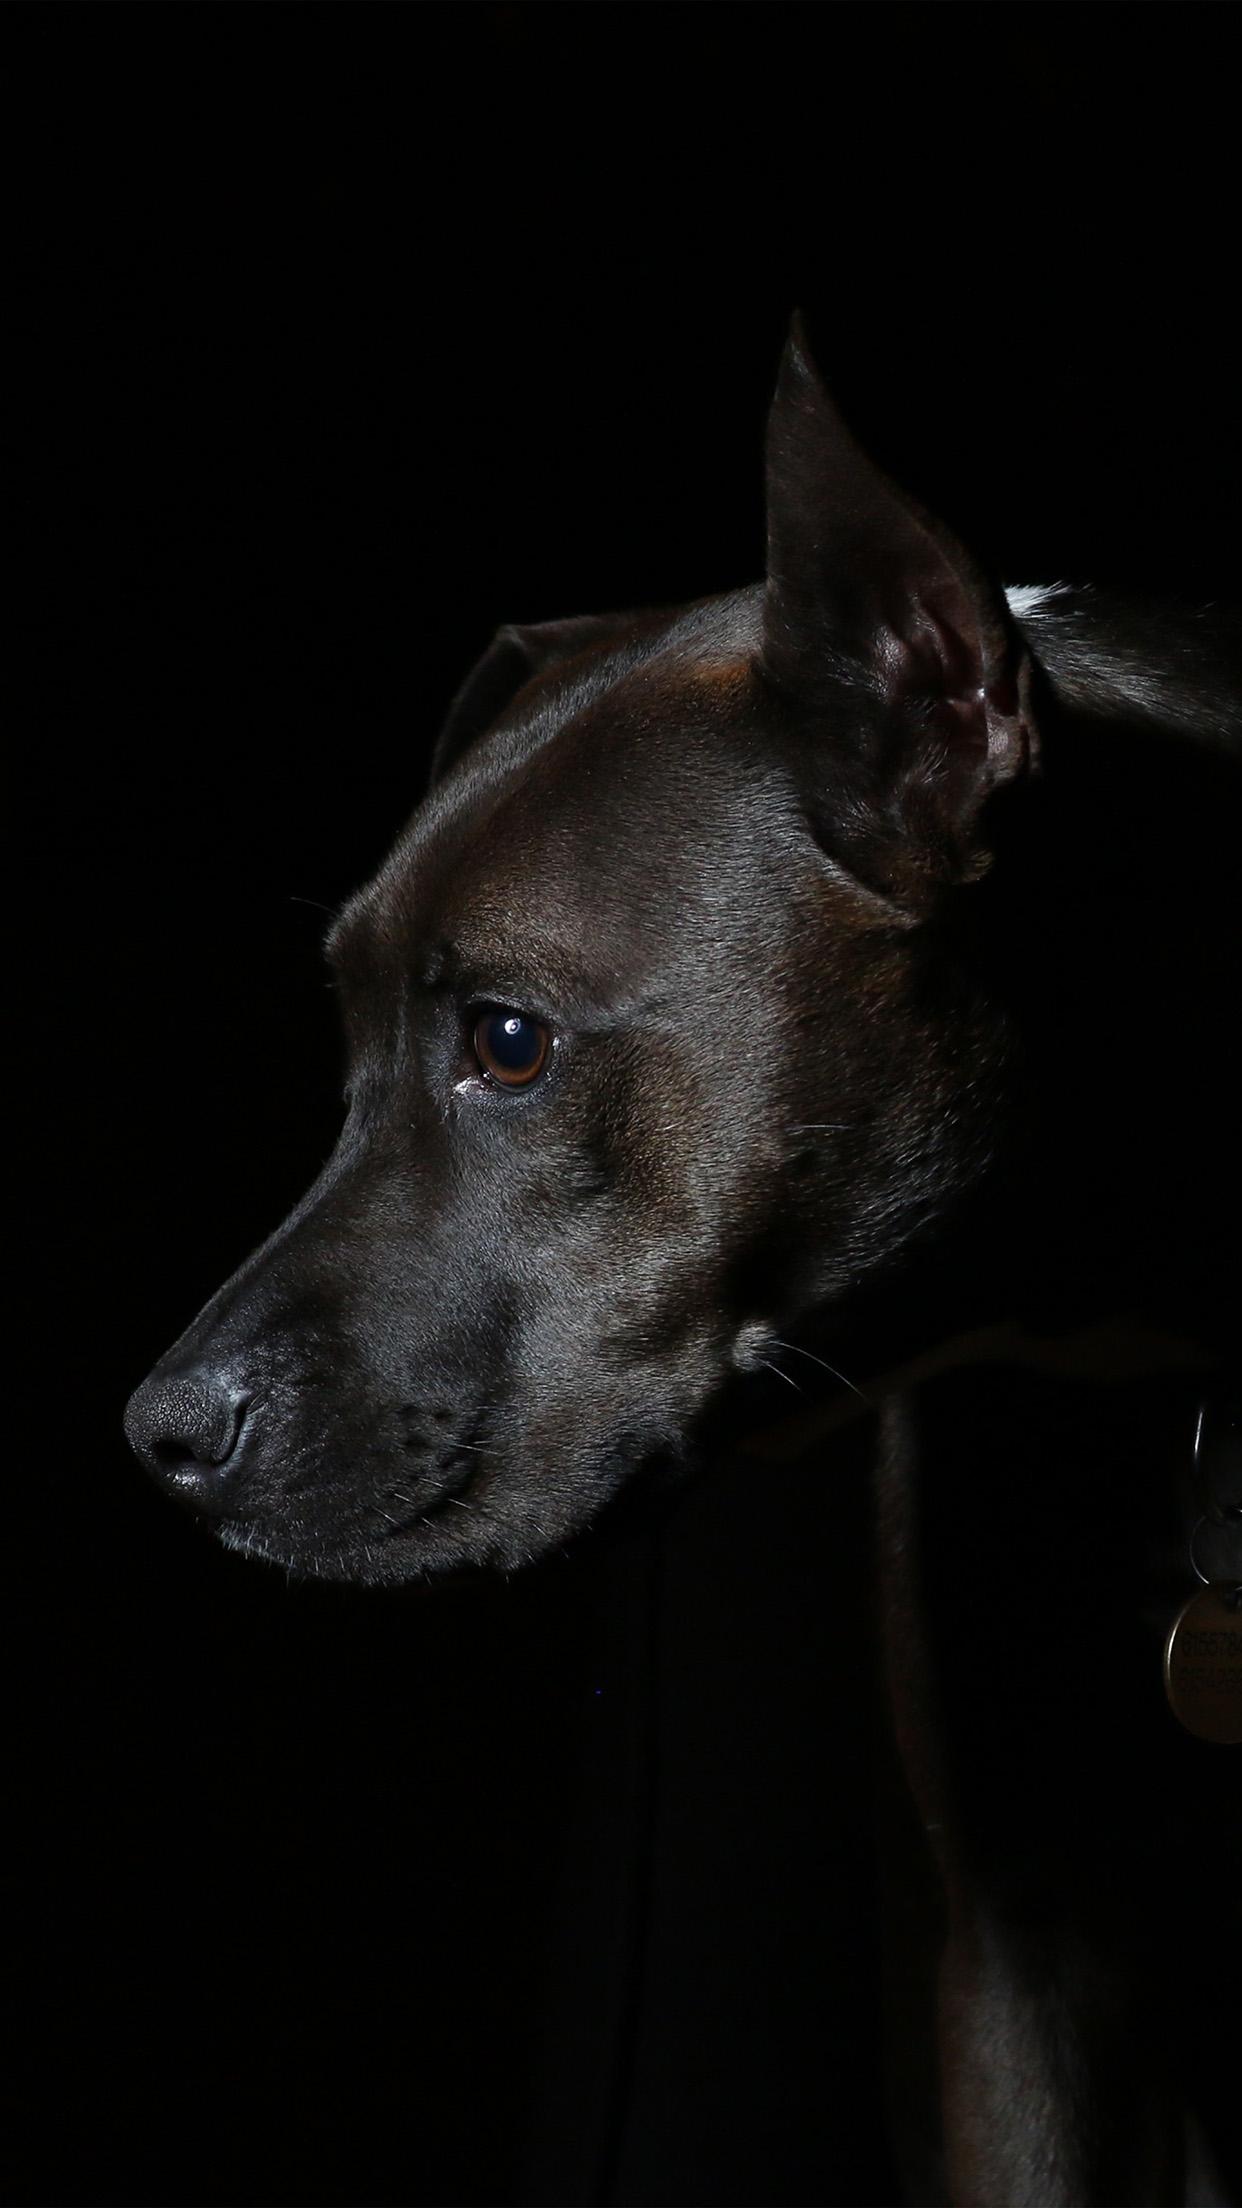 Nj37 Dog Dark Animal Wallpaper